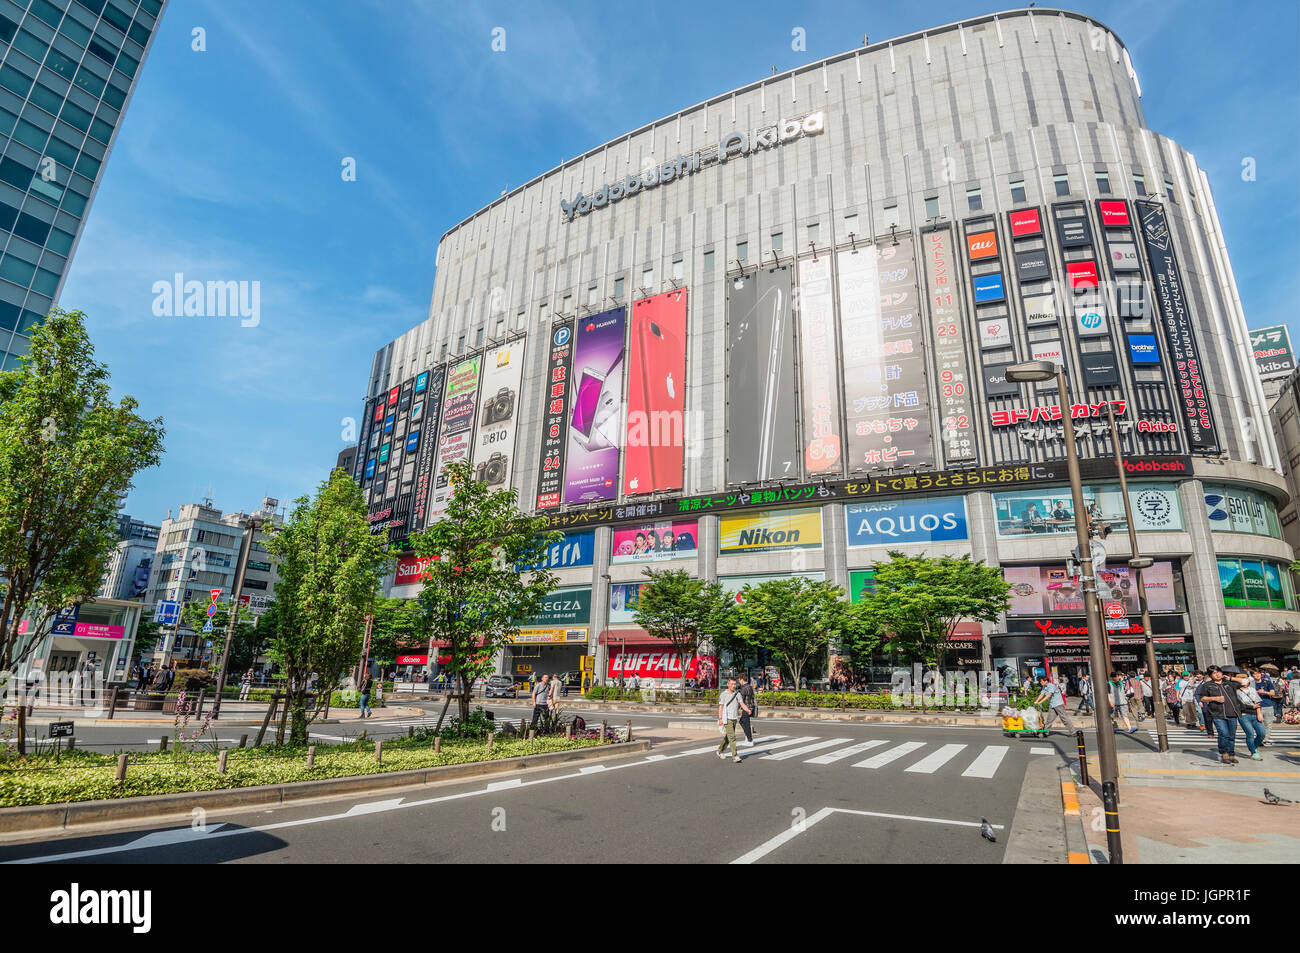 Yodobashi Akiba elektronische Kaufhaus am Bahnhof Akihabara und Electric Town, Tokyo, Japan | Yodobashi Akiba Kamera Stockbild